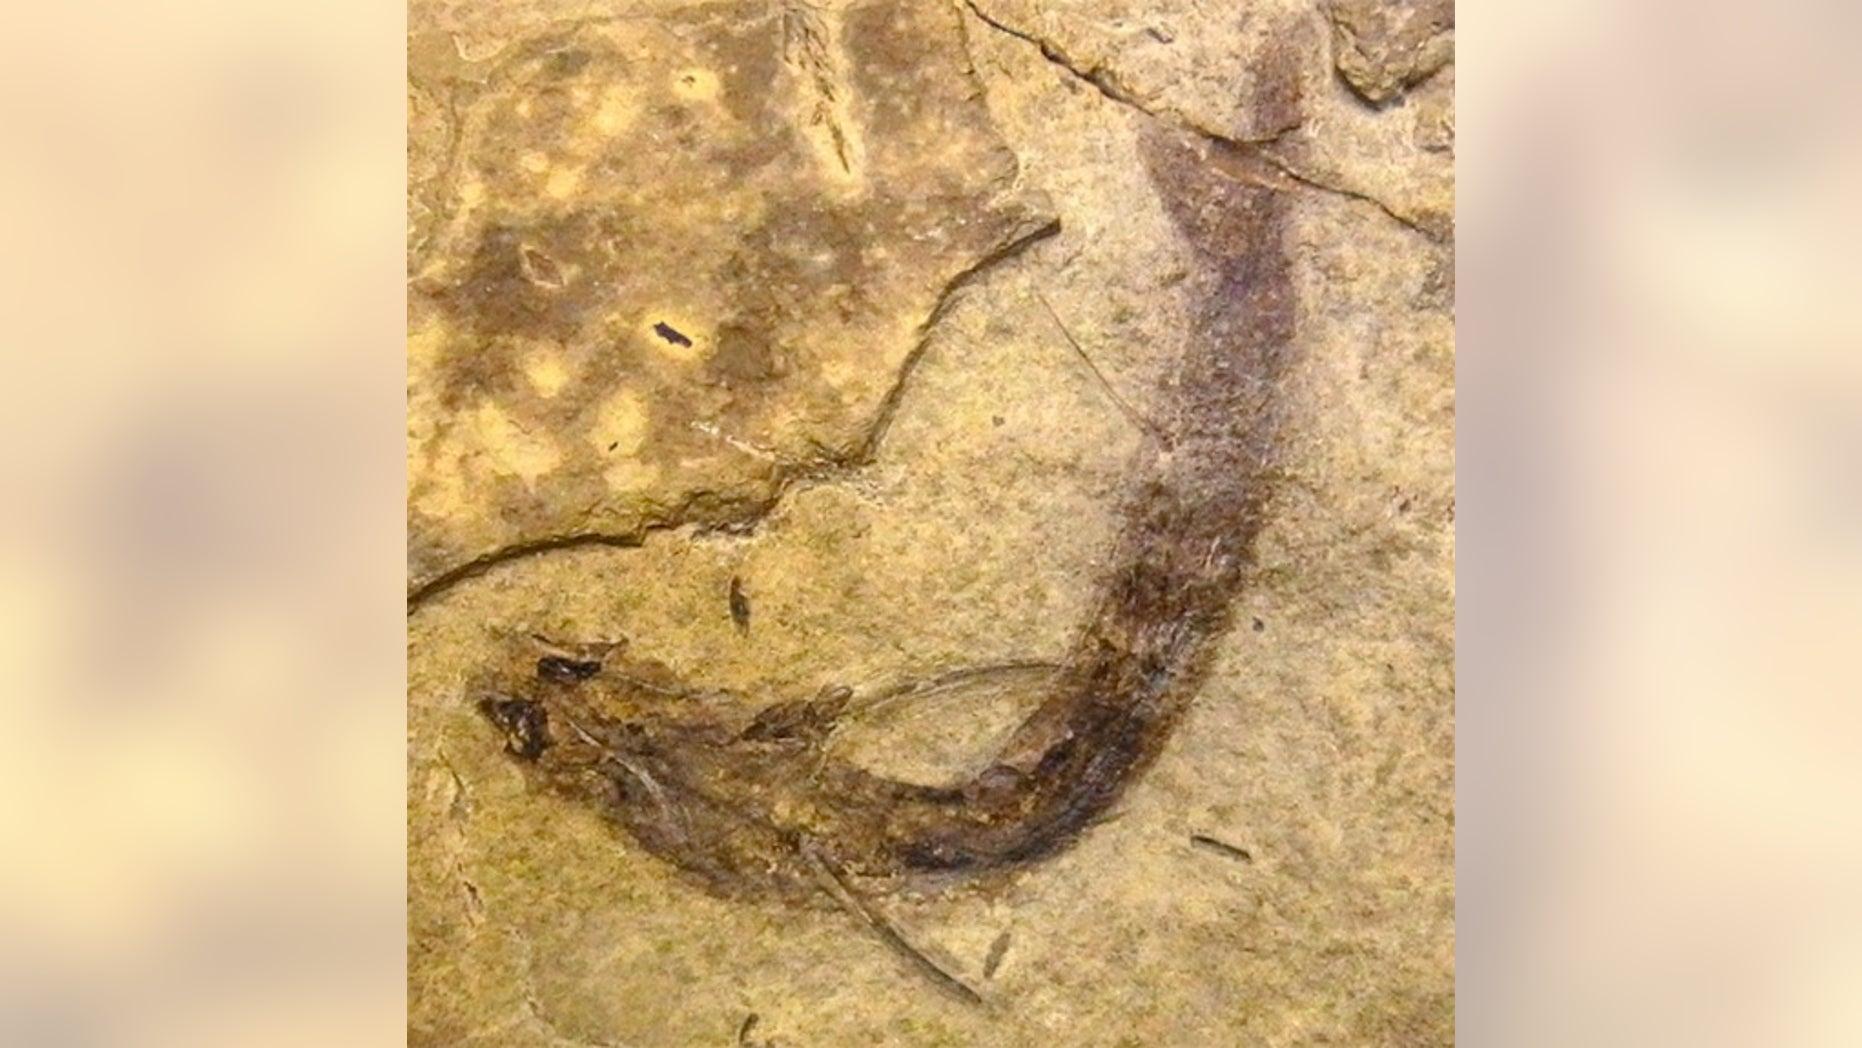 Fossilised Acanthodes bridgei with eye tissues intact.